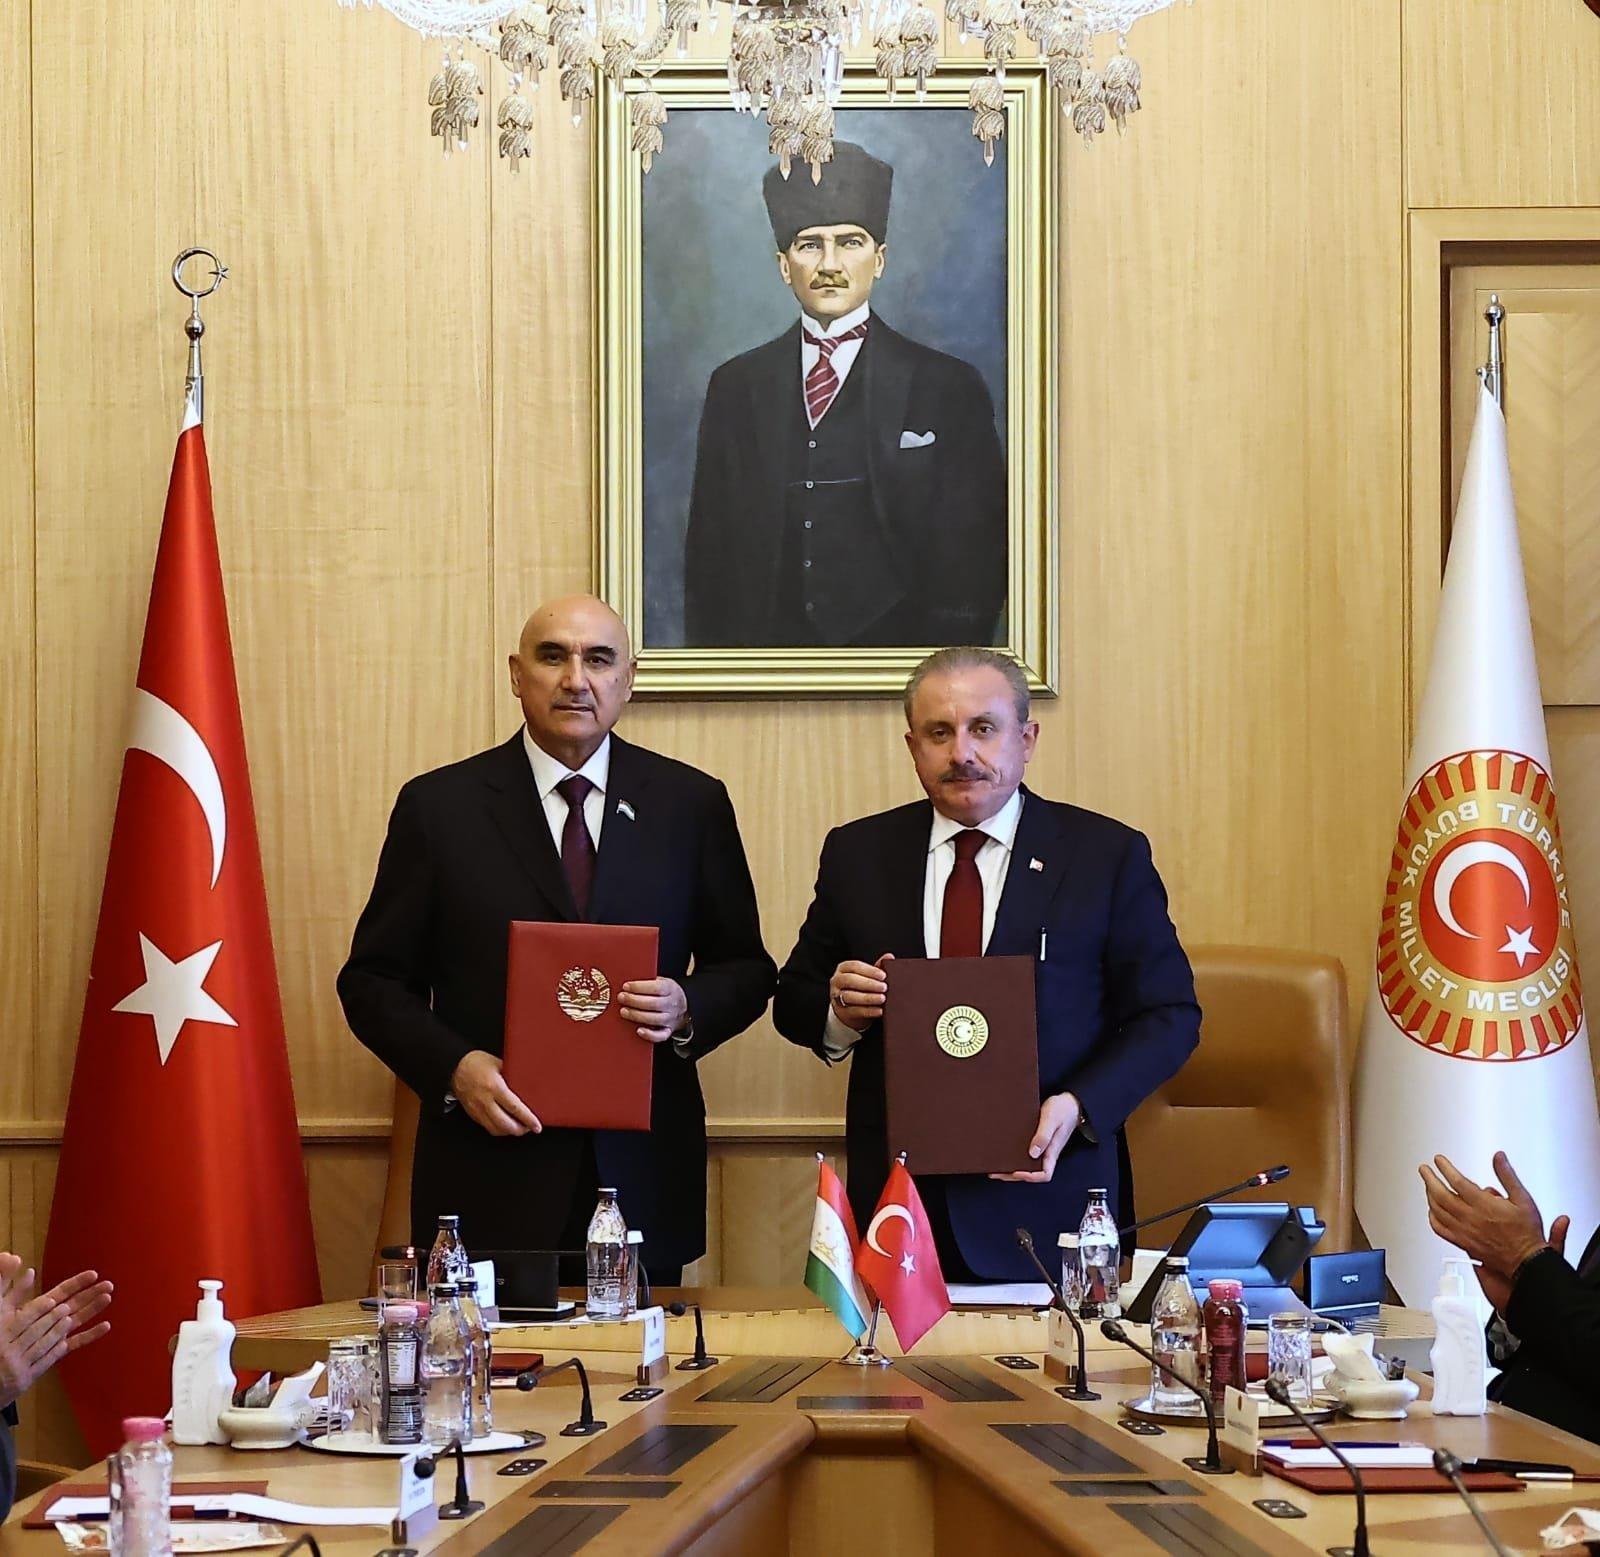 Parliament Speaker Mustafa Şentop (R), Tajik counterpart Mahmadtoir Zokirzoda pose after signing the interparliamentary cooperation protocol in Ankara, Turkey, Oct. 13, 2021. (AA Photo)